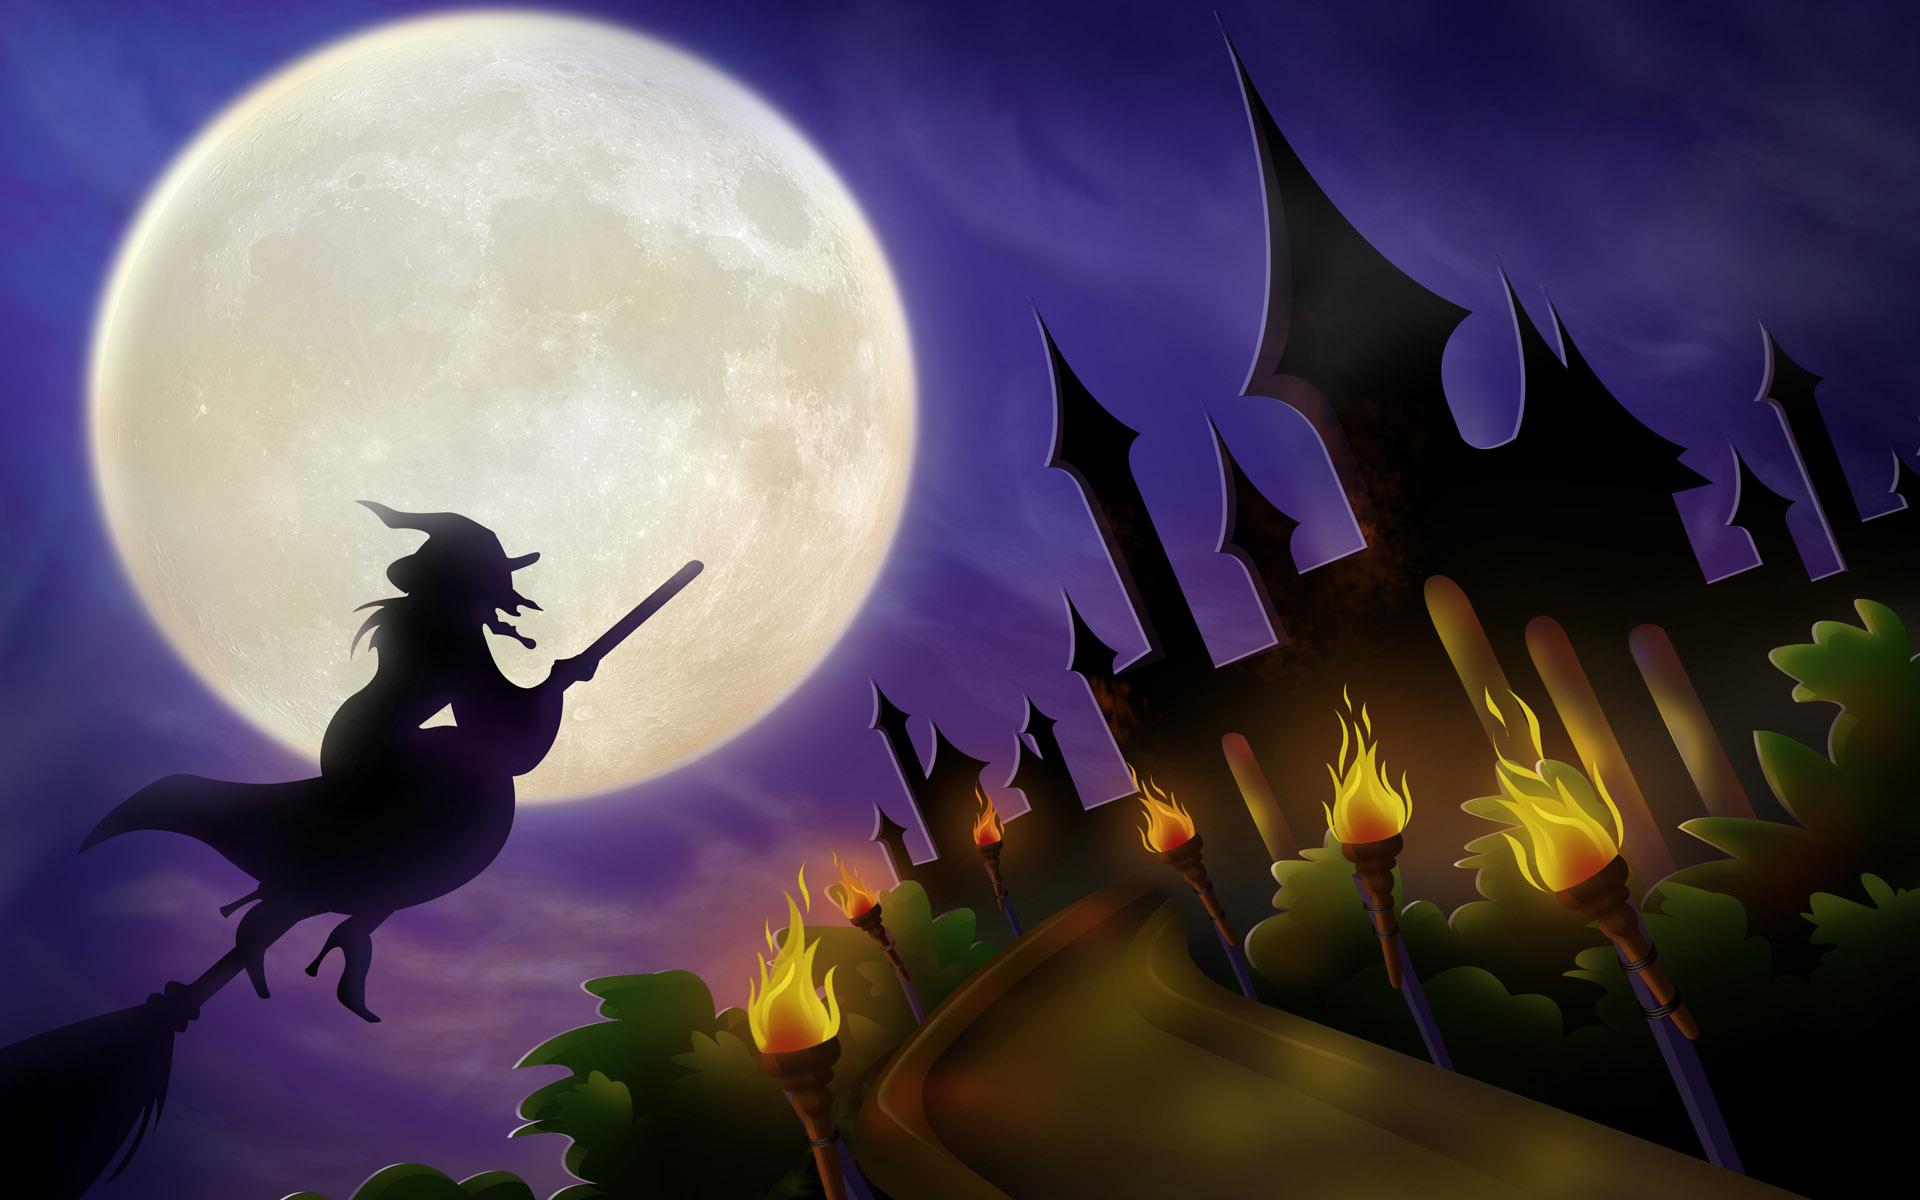 fondos halloween wallpapers gratis - photo #41